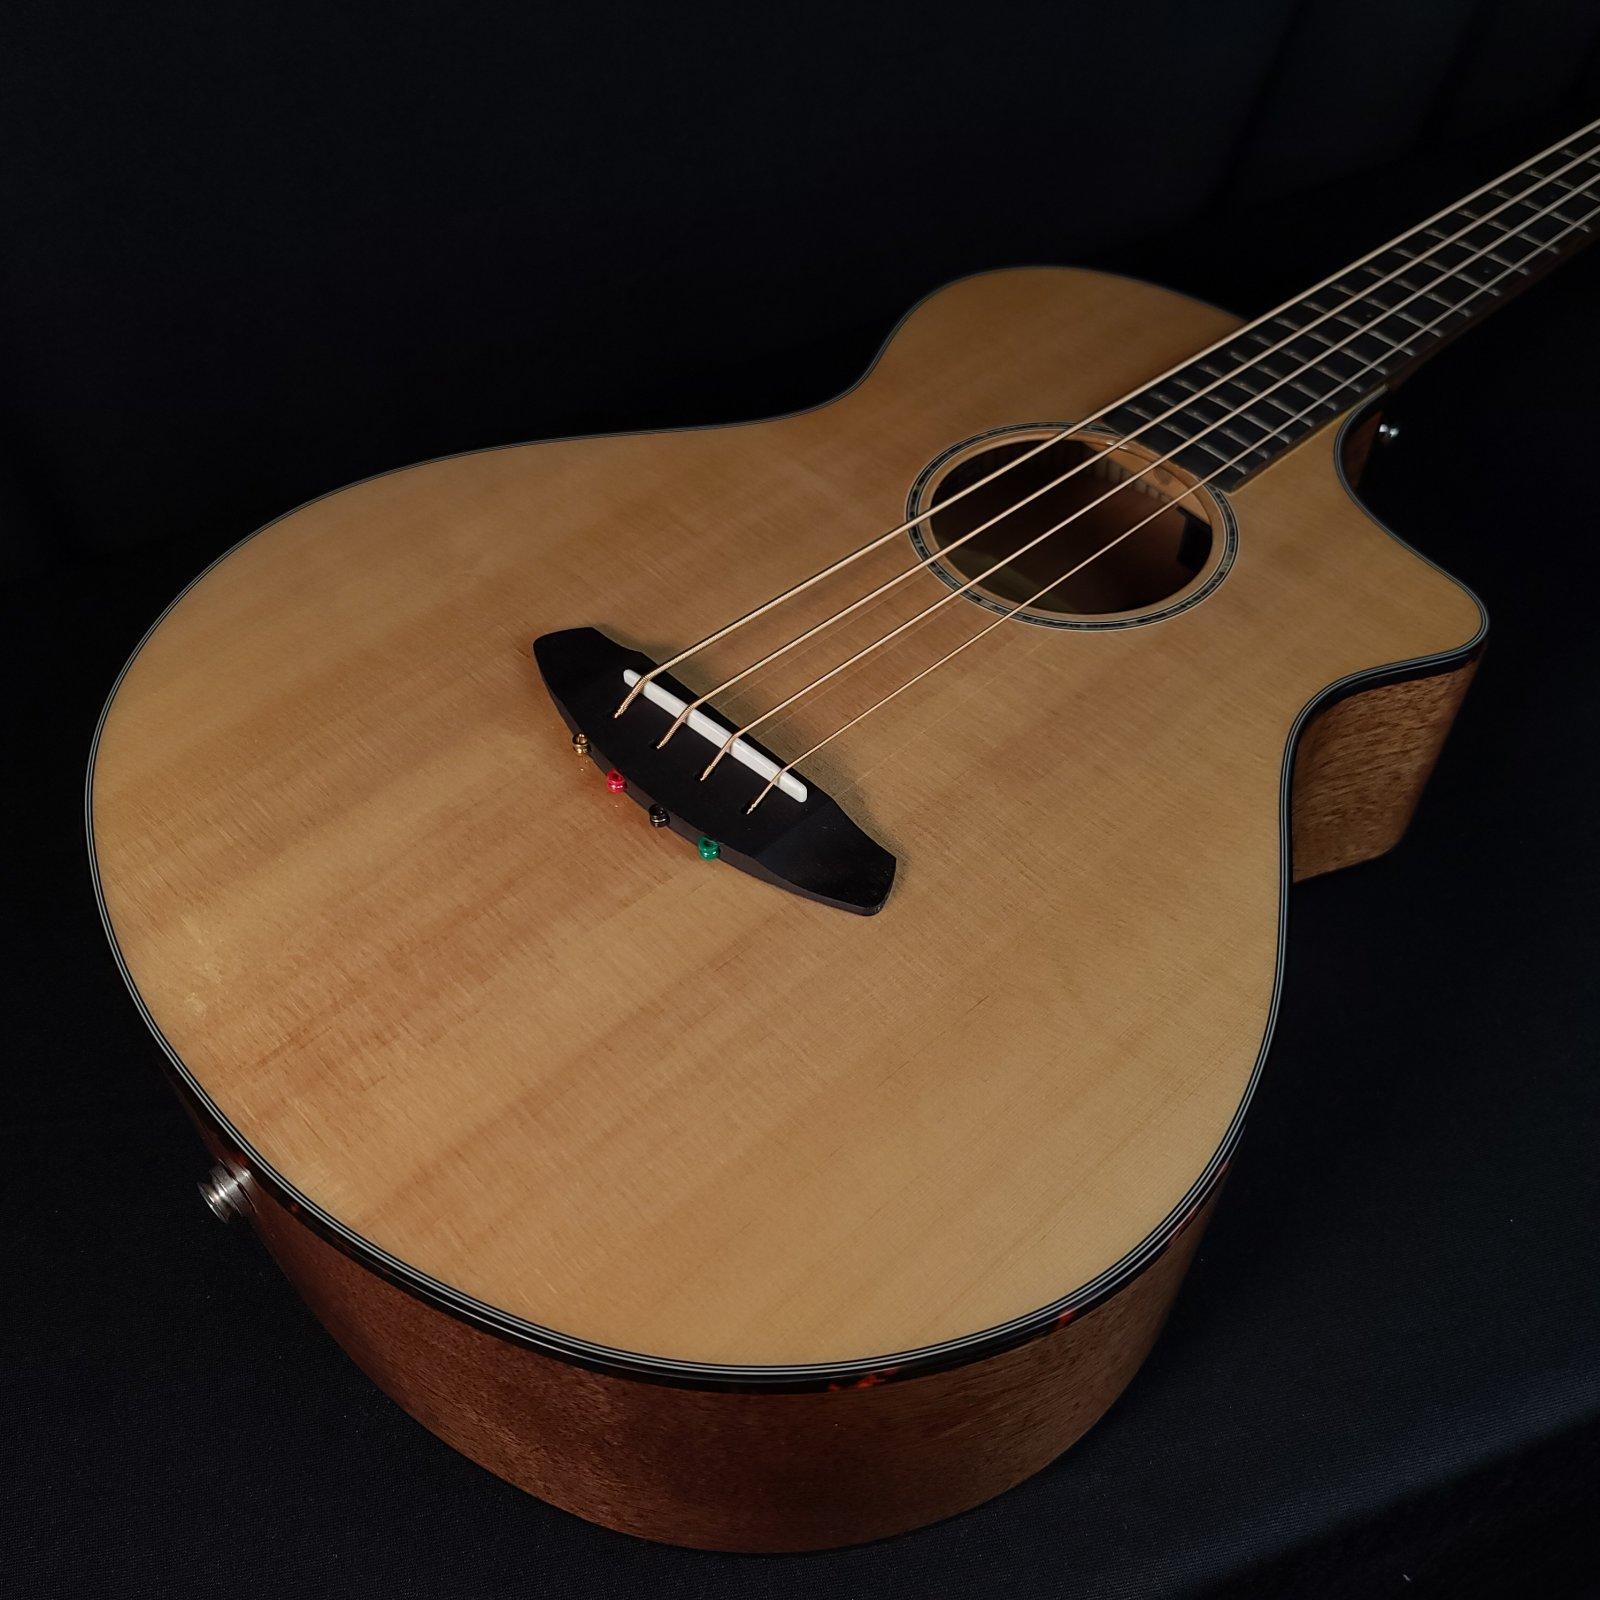 Breedlove Pursuit Concert Bass Cutaway Acoustic Electric w/ Gig Bag